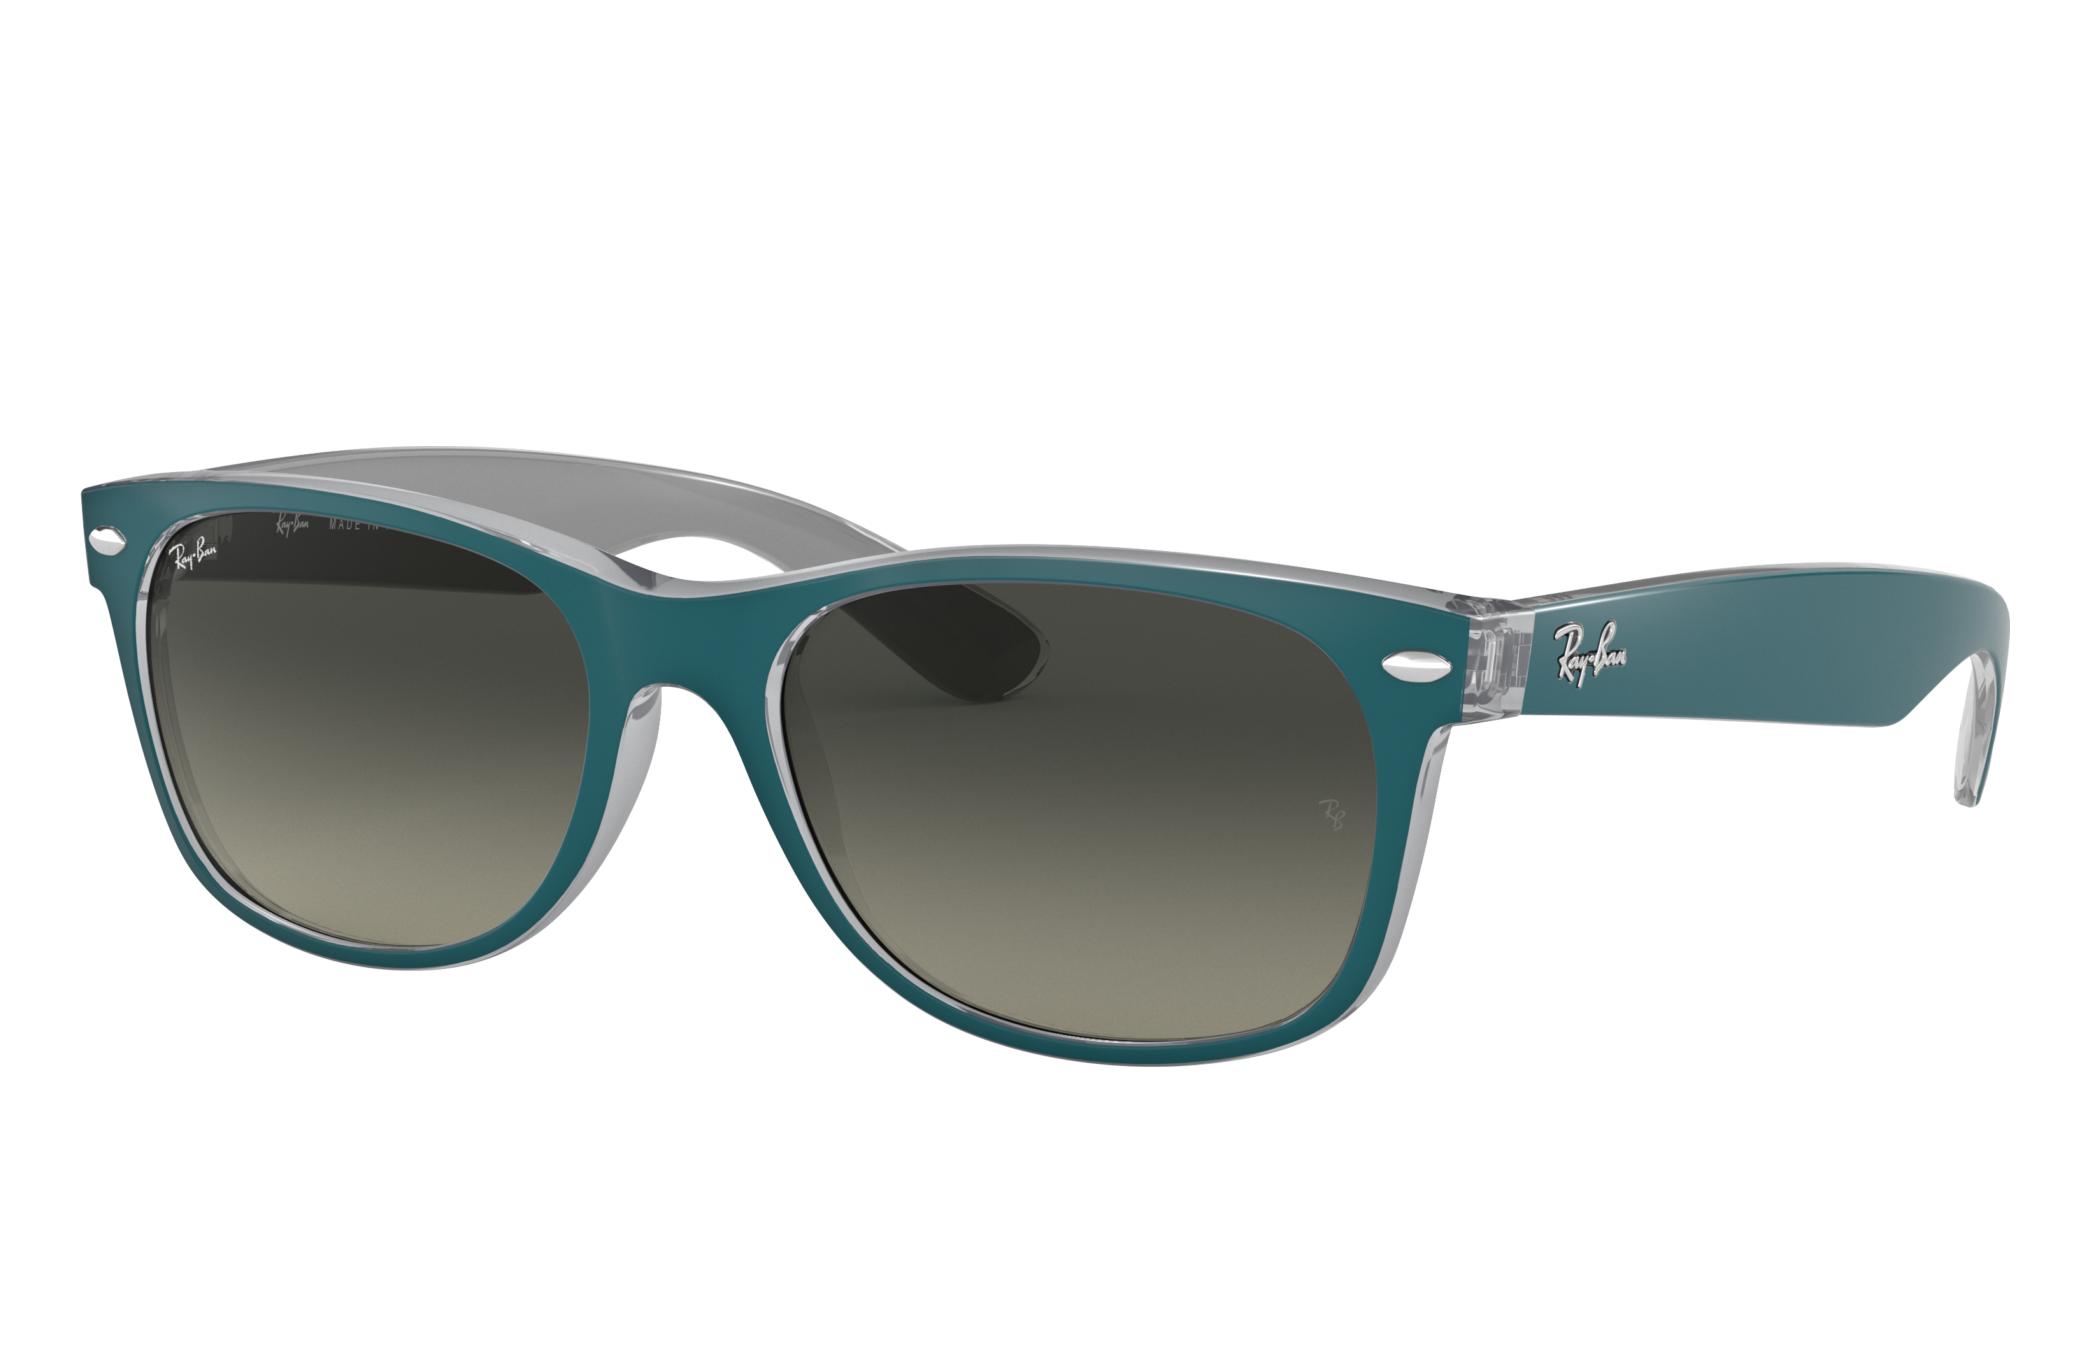 Ray-Ban New Wayfarer Bicolor Blue, Gray Lenses - RB2132